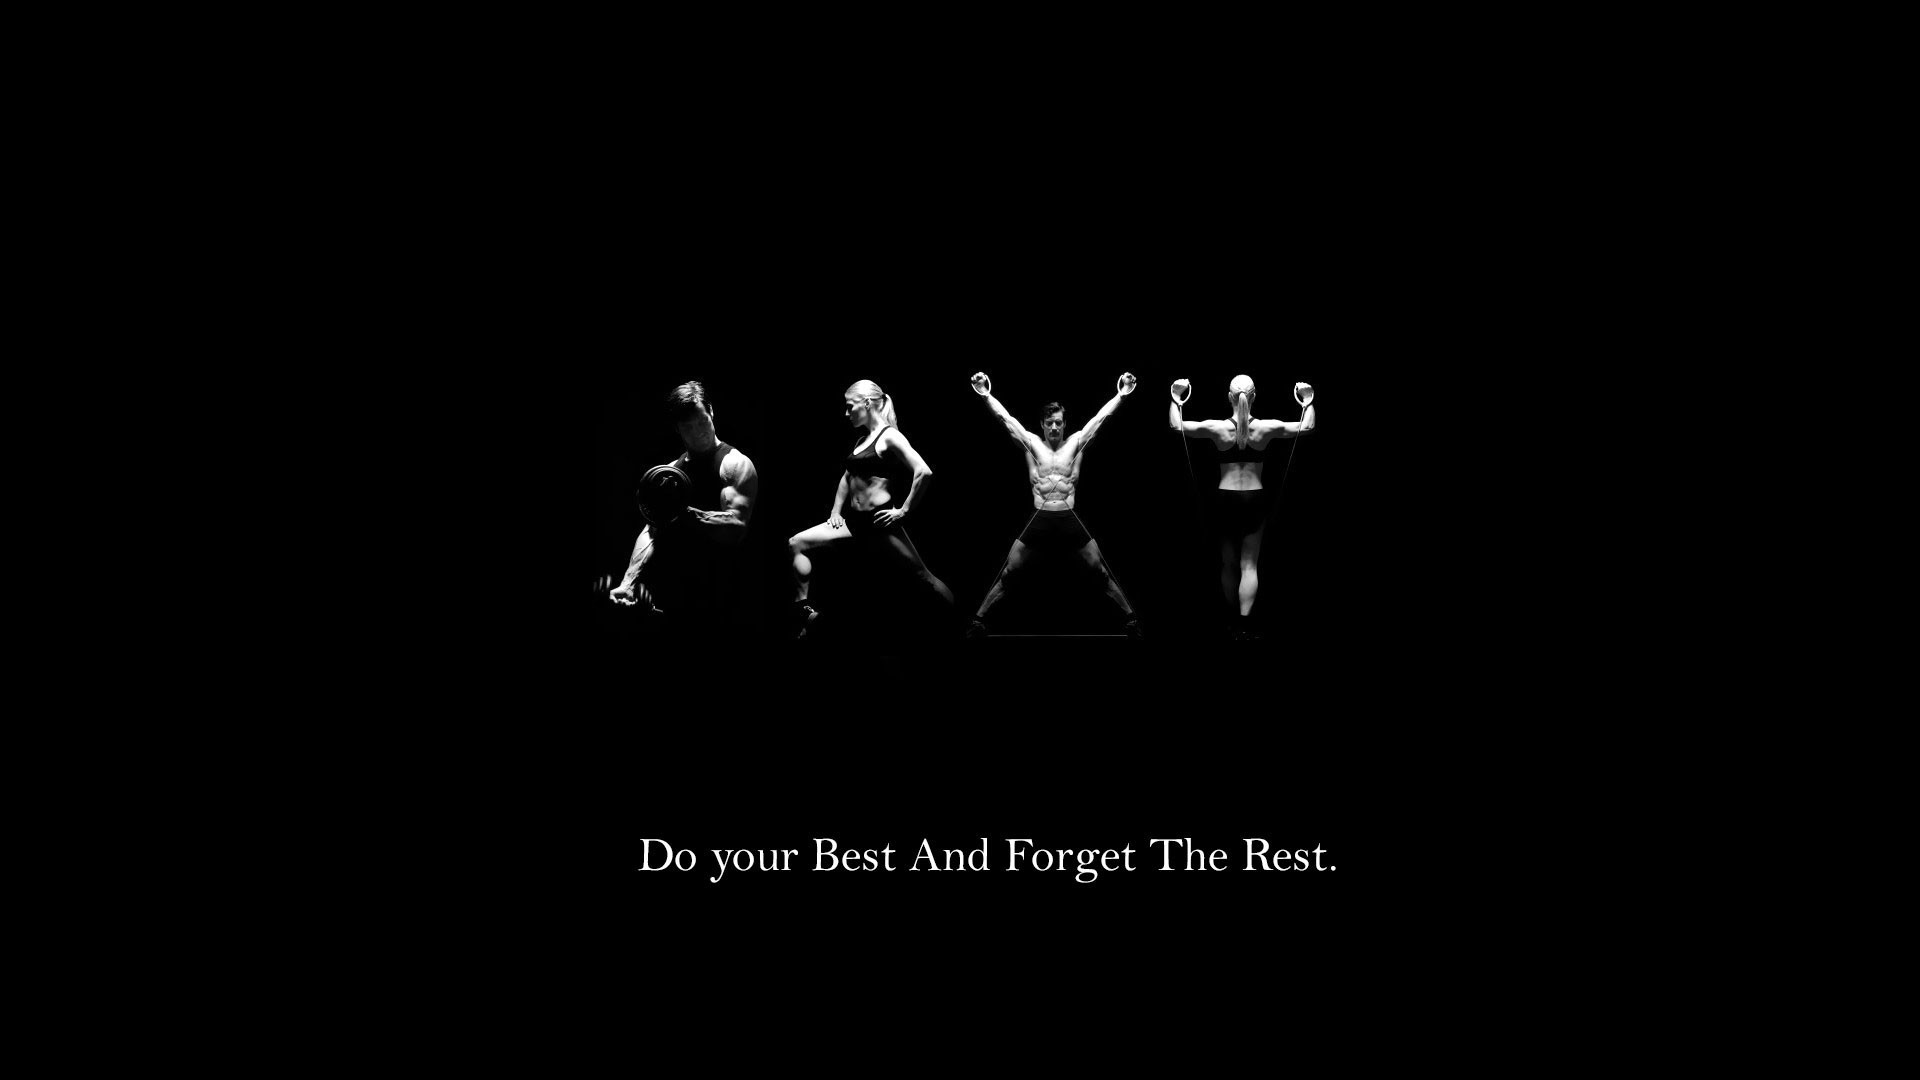 hd pics photos fitness gym motivation hd quality desktop background  wallpaper